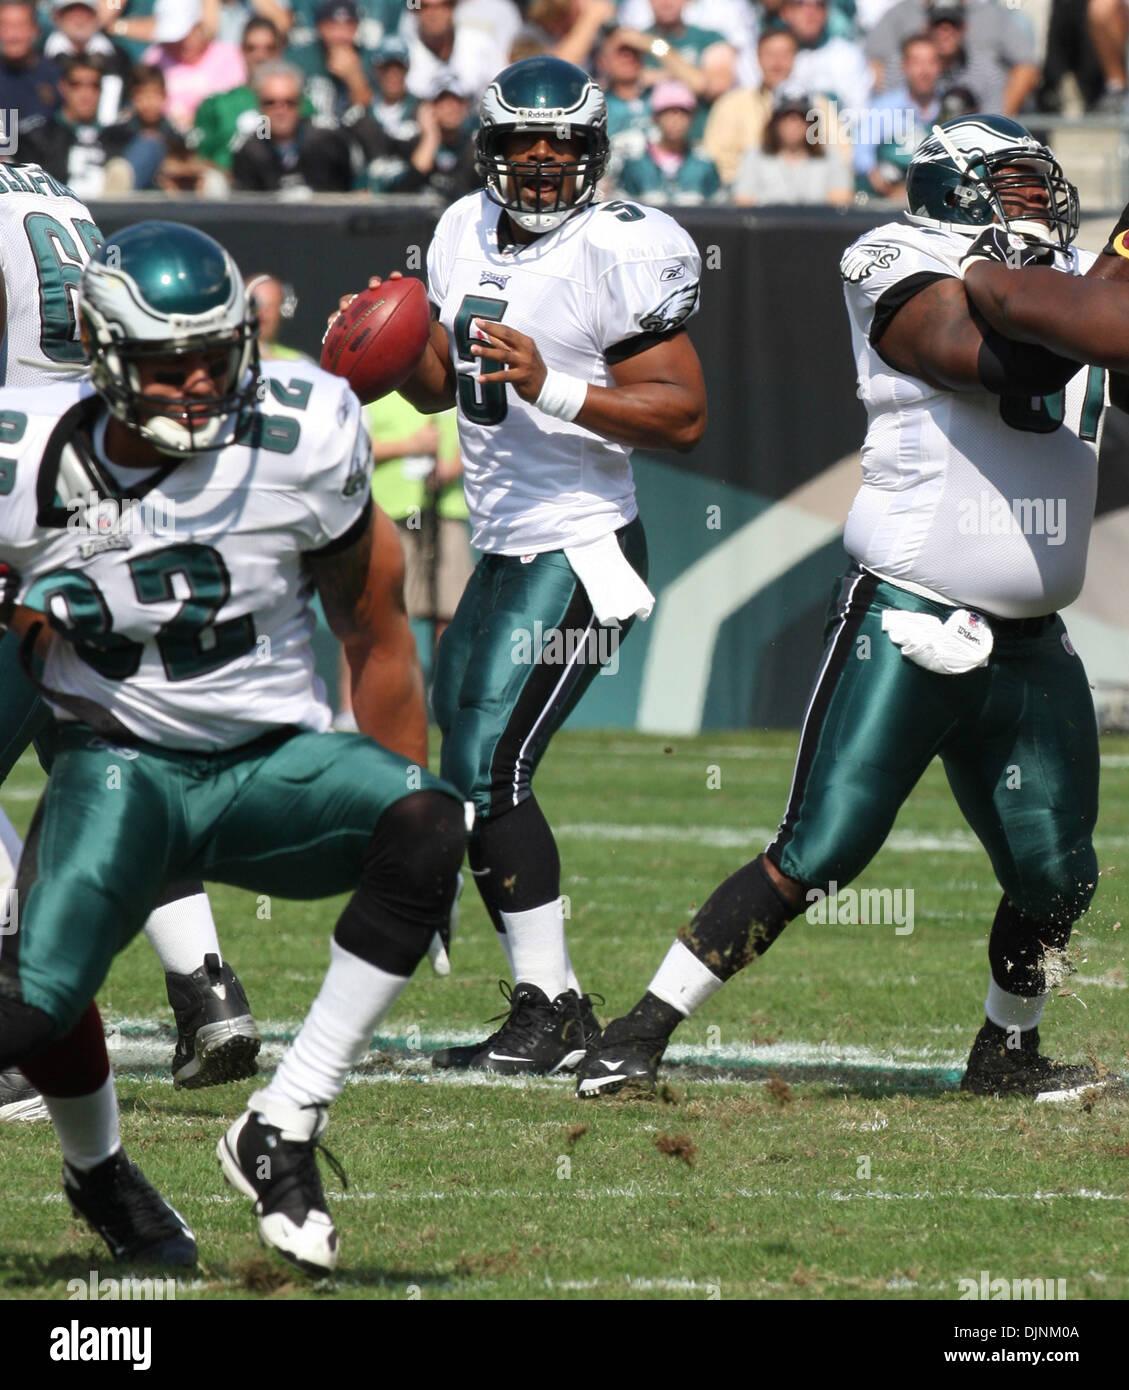 4f5b9fefd34 Oct 05, 2008 - Philadelphia, Pennsylvania, USA - Philadelphia Eagles  Quarterback #5